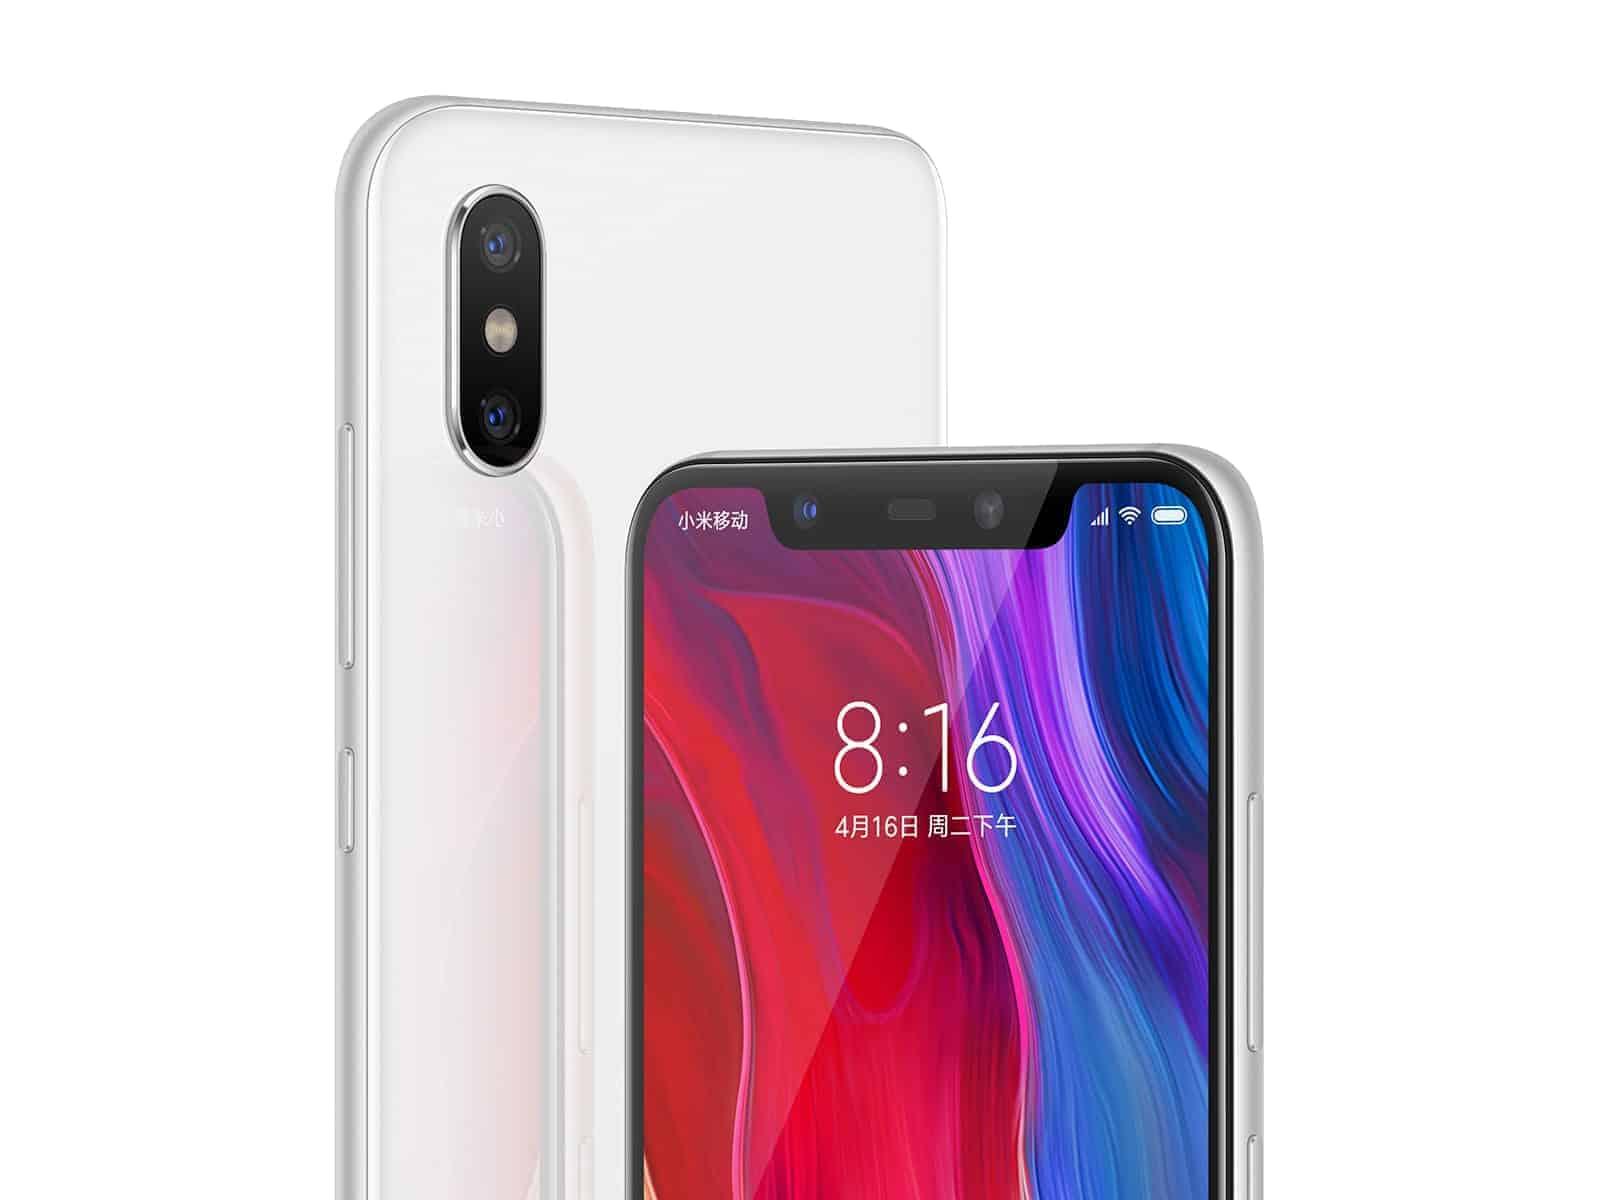 Xiaomi Mi 8 official image 56